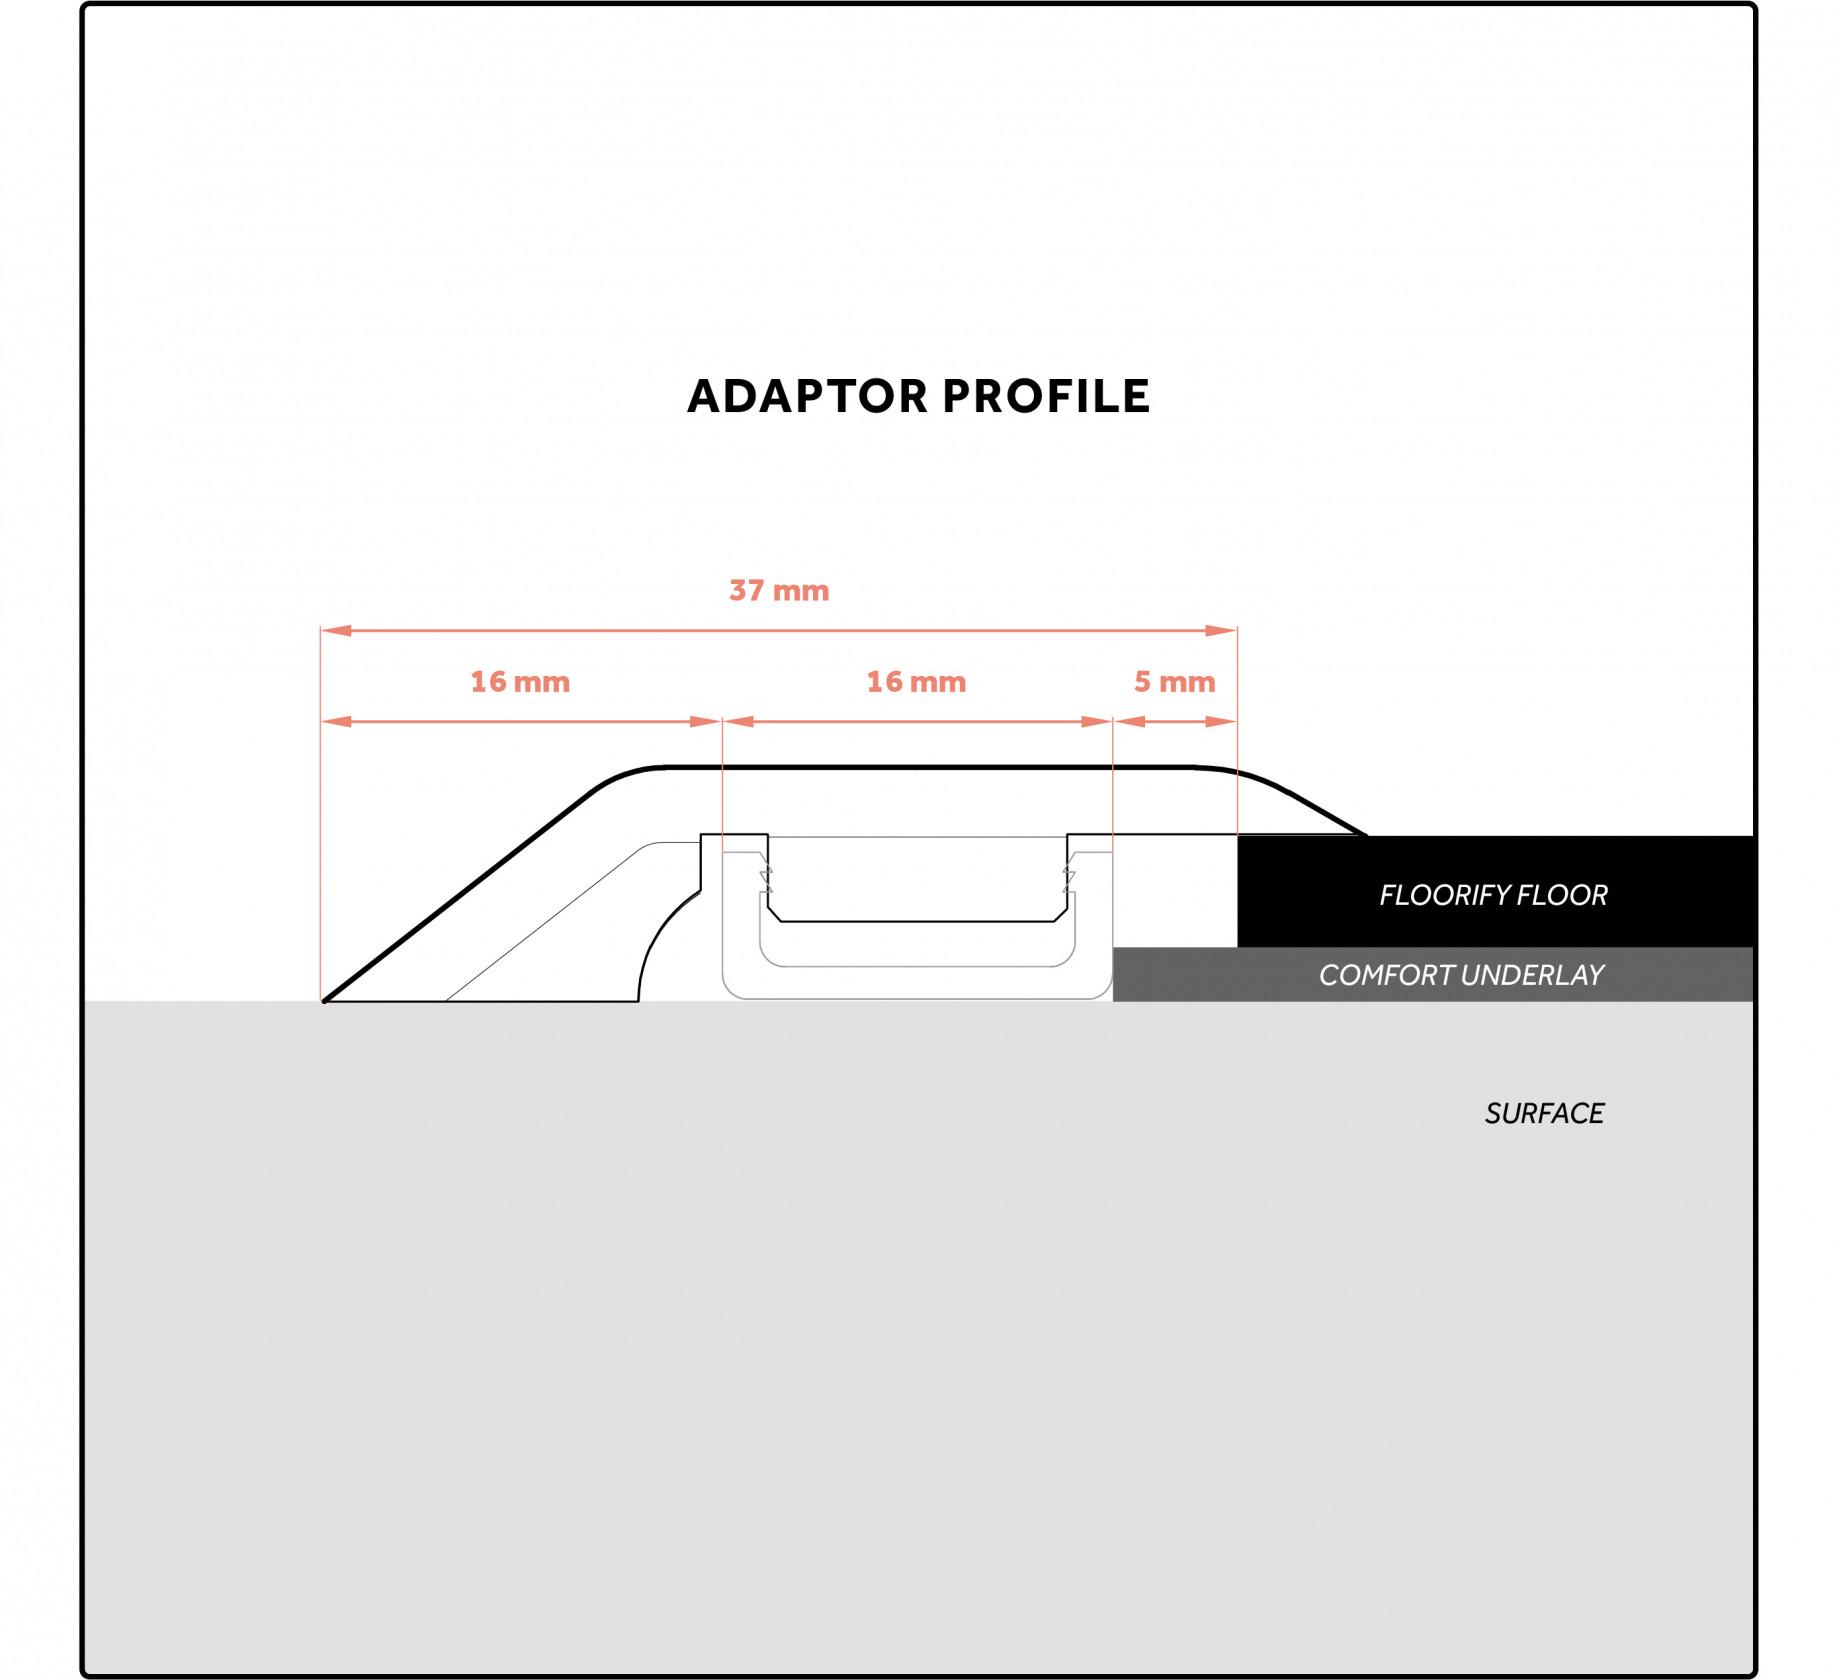 Floorify - Adaptor profile.jpg